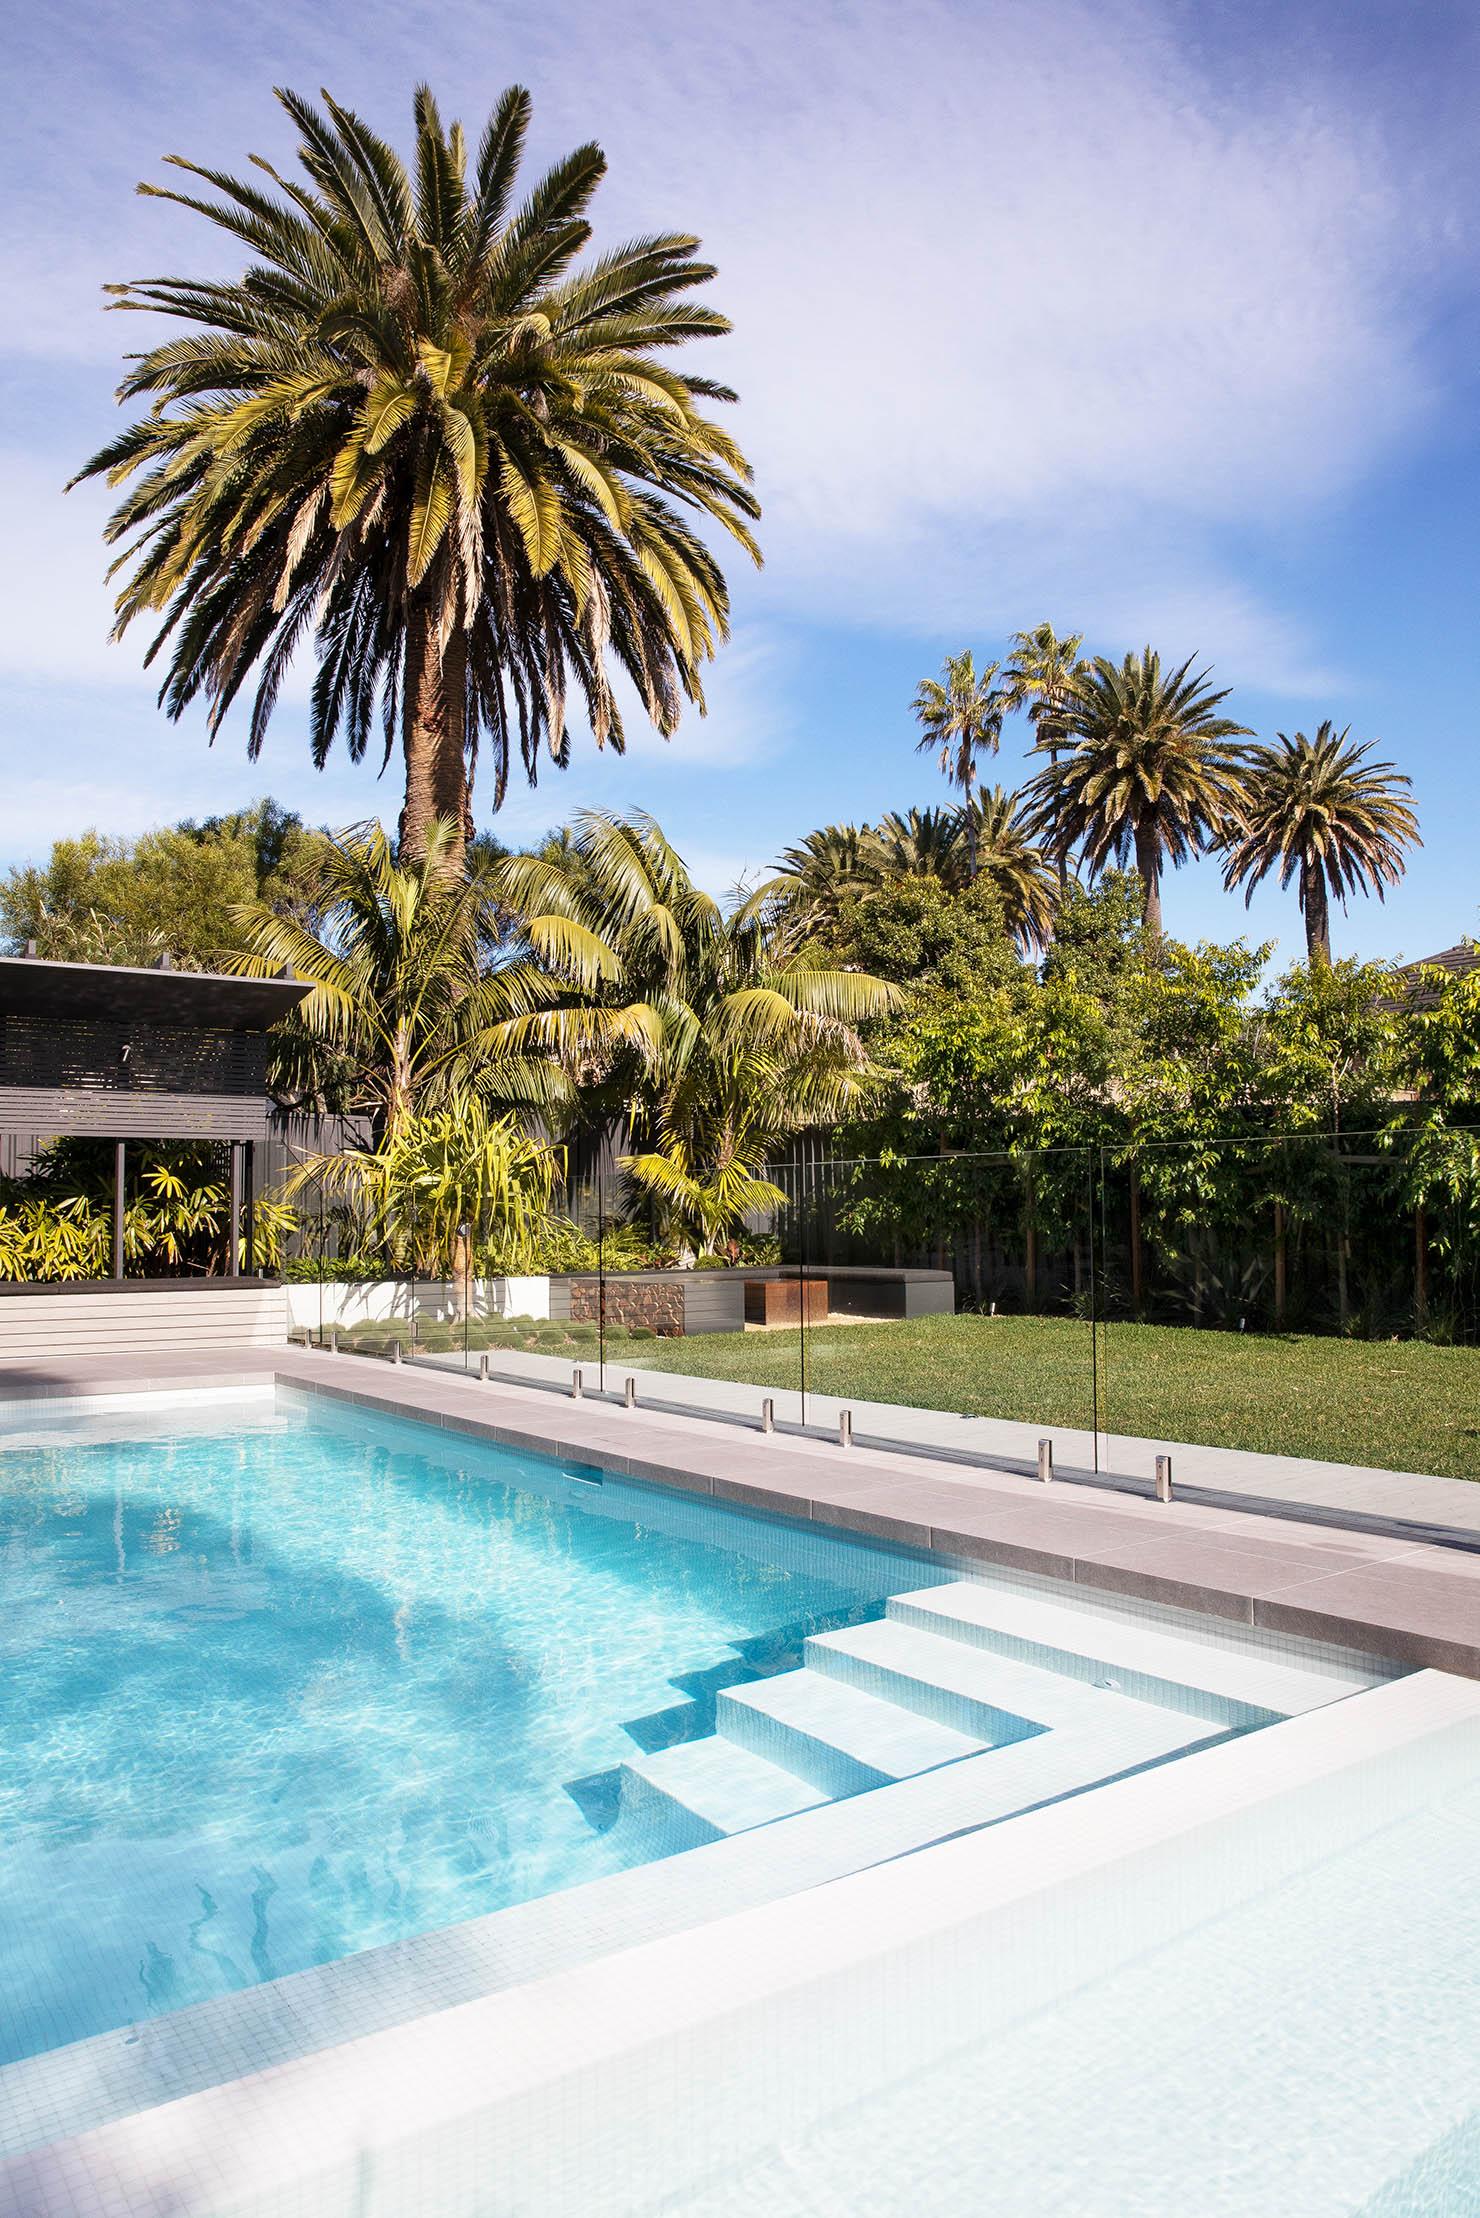 Blog hero-article-images themed-garden-part-2-tropical-gardens